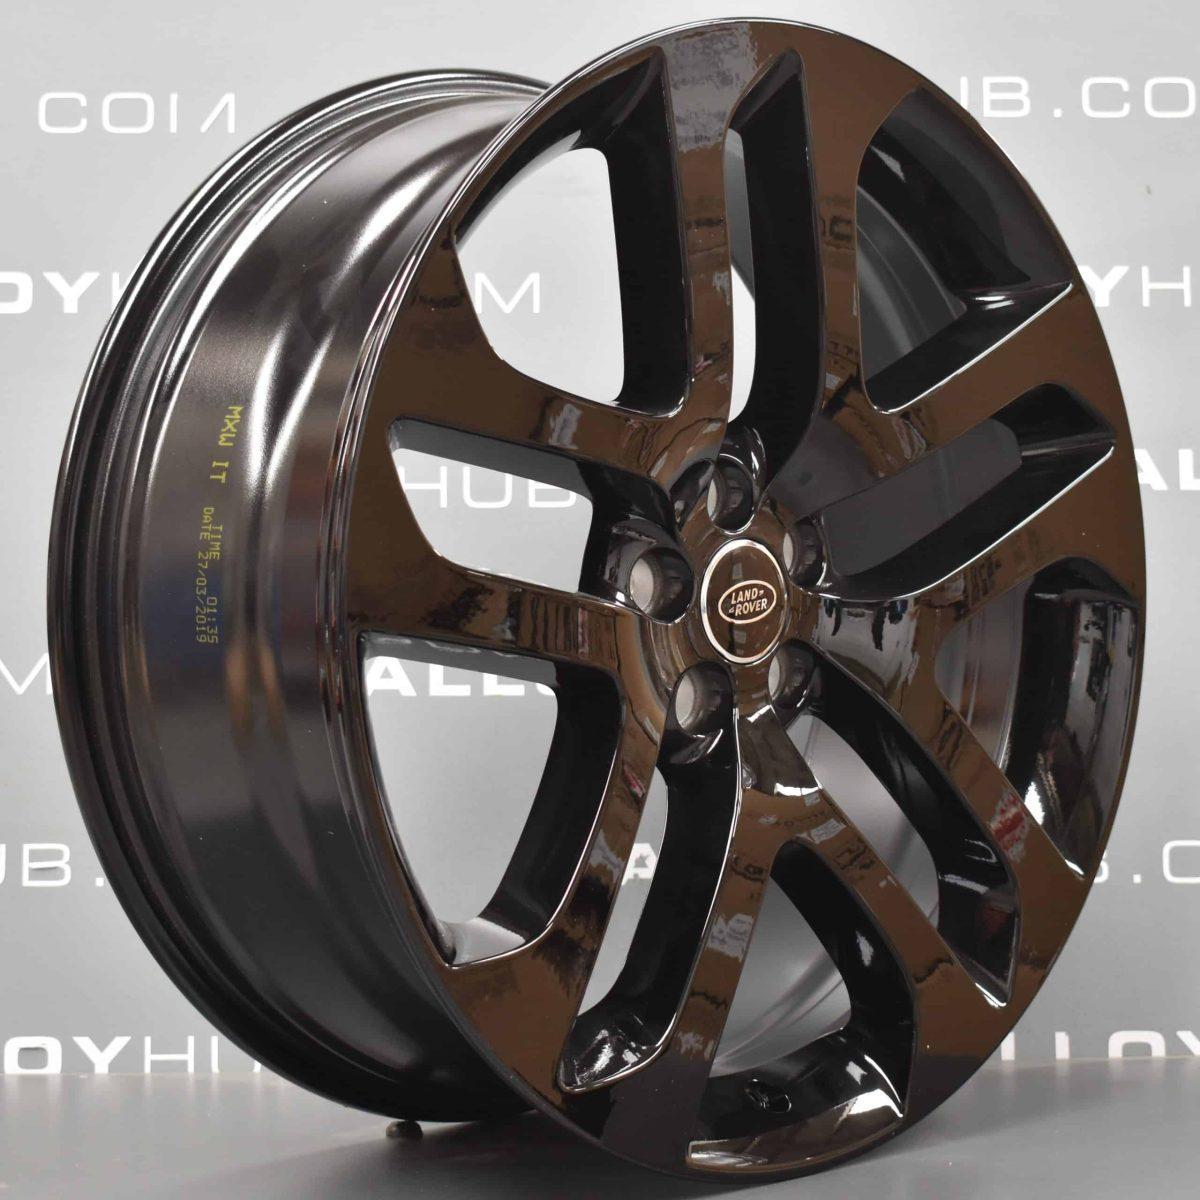 "Genuine Range Rover Evoque 21"" inch Style 5078 5 Split-Spoke Alloy Wheels with Gloss Black Finish LR114523"